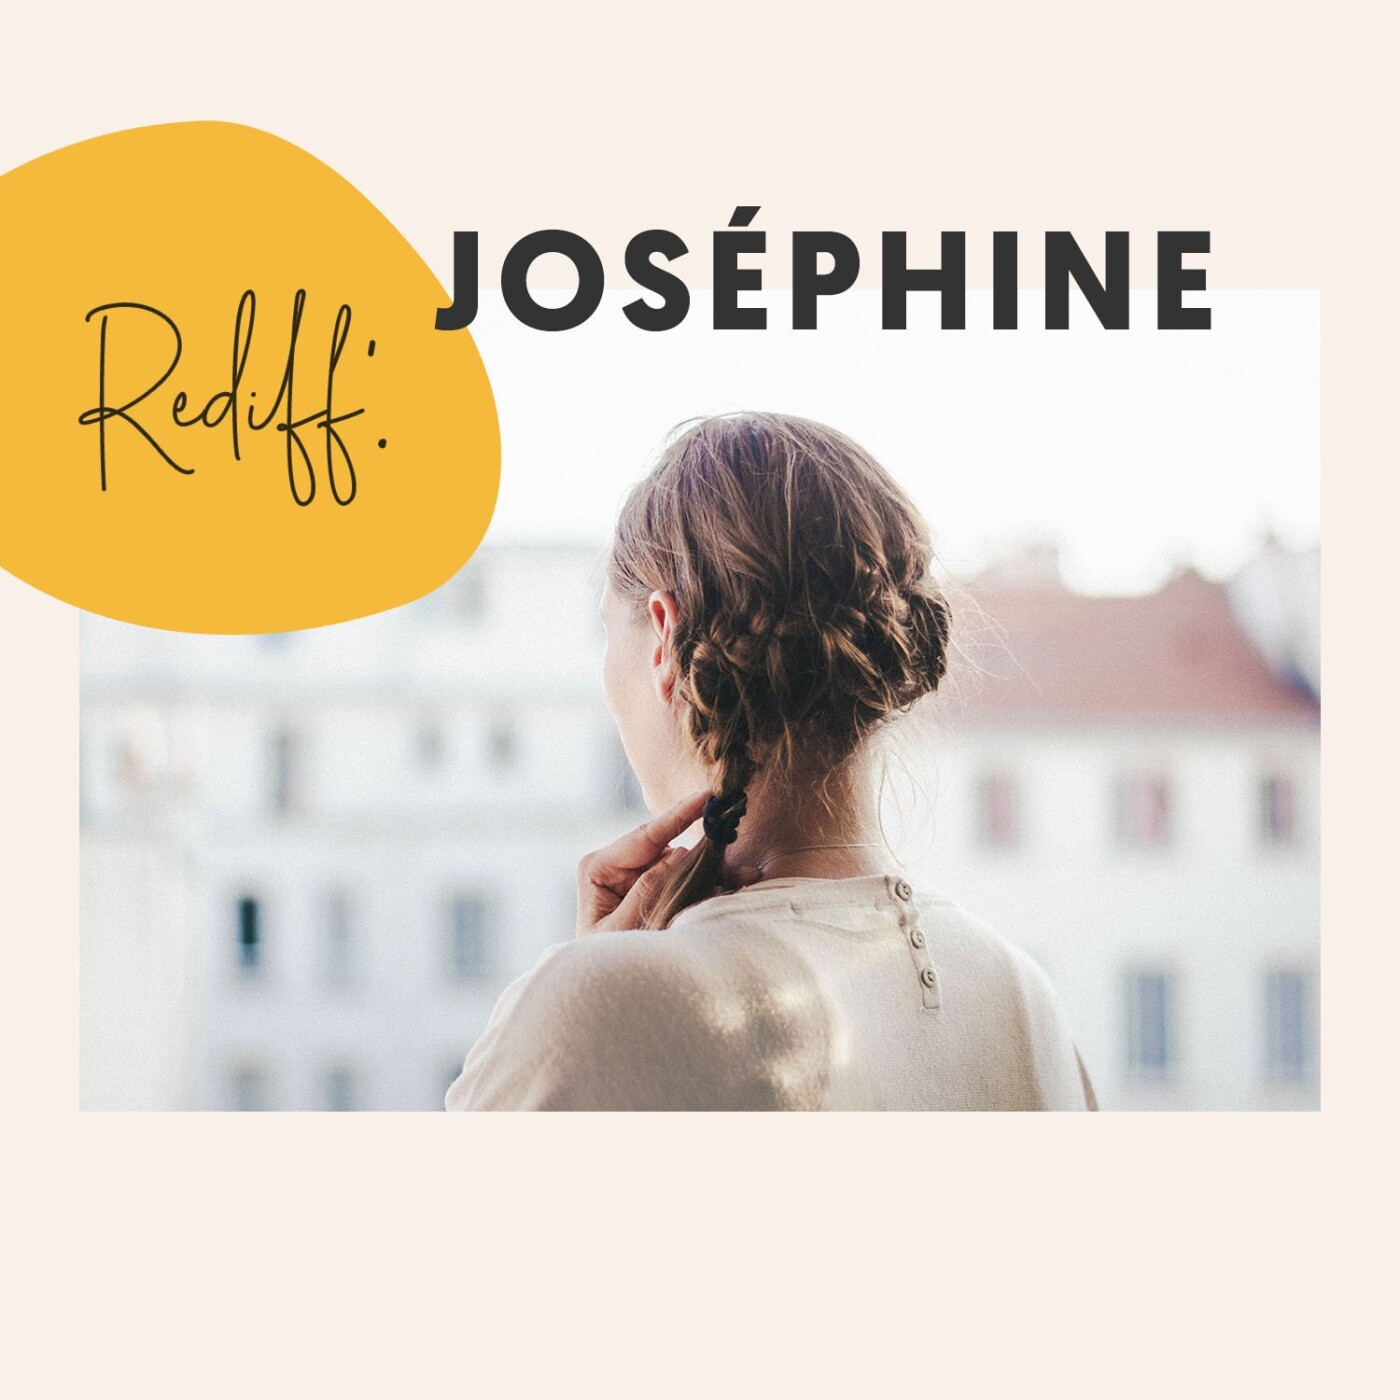 Rediff' • Joséphine